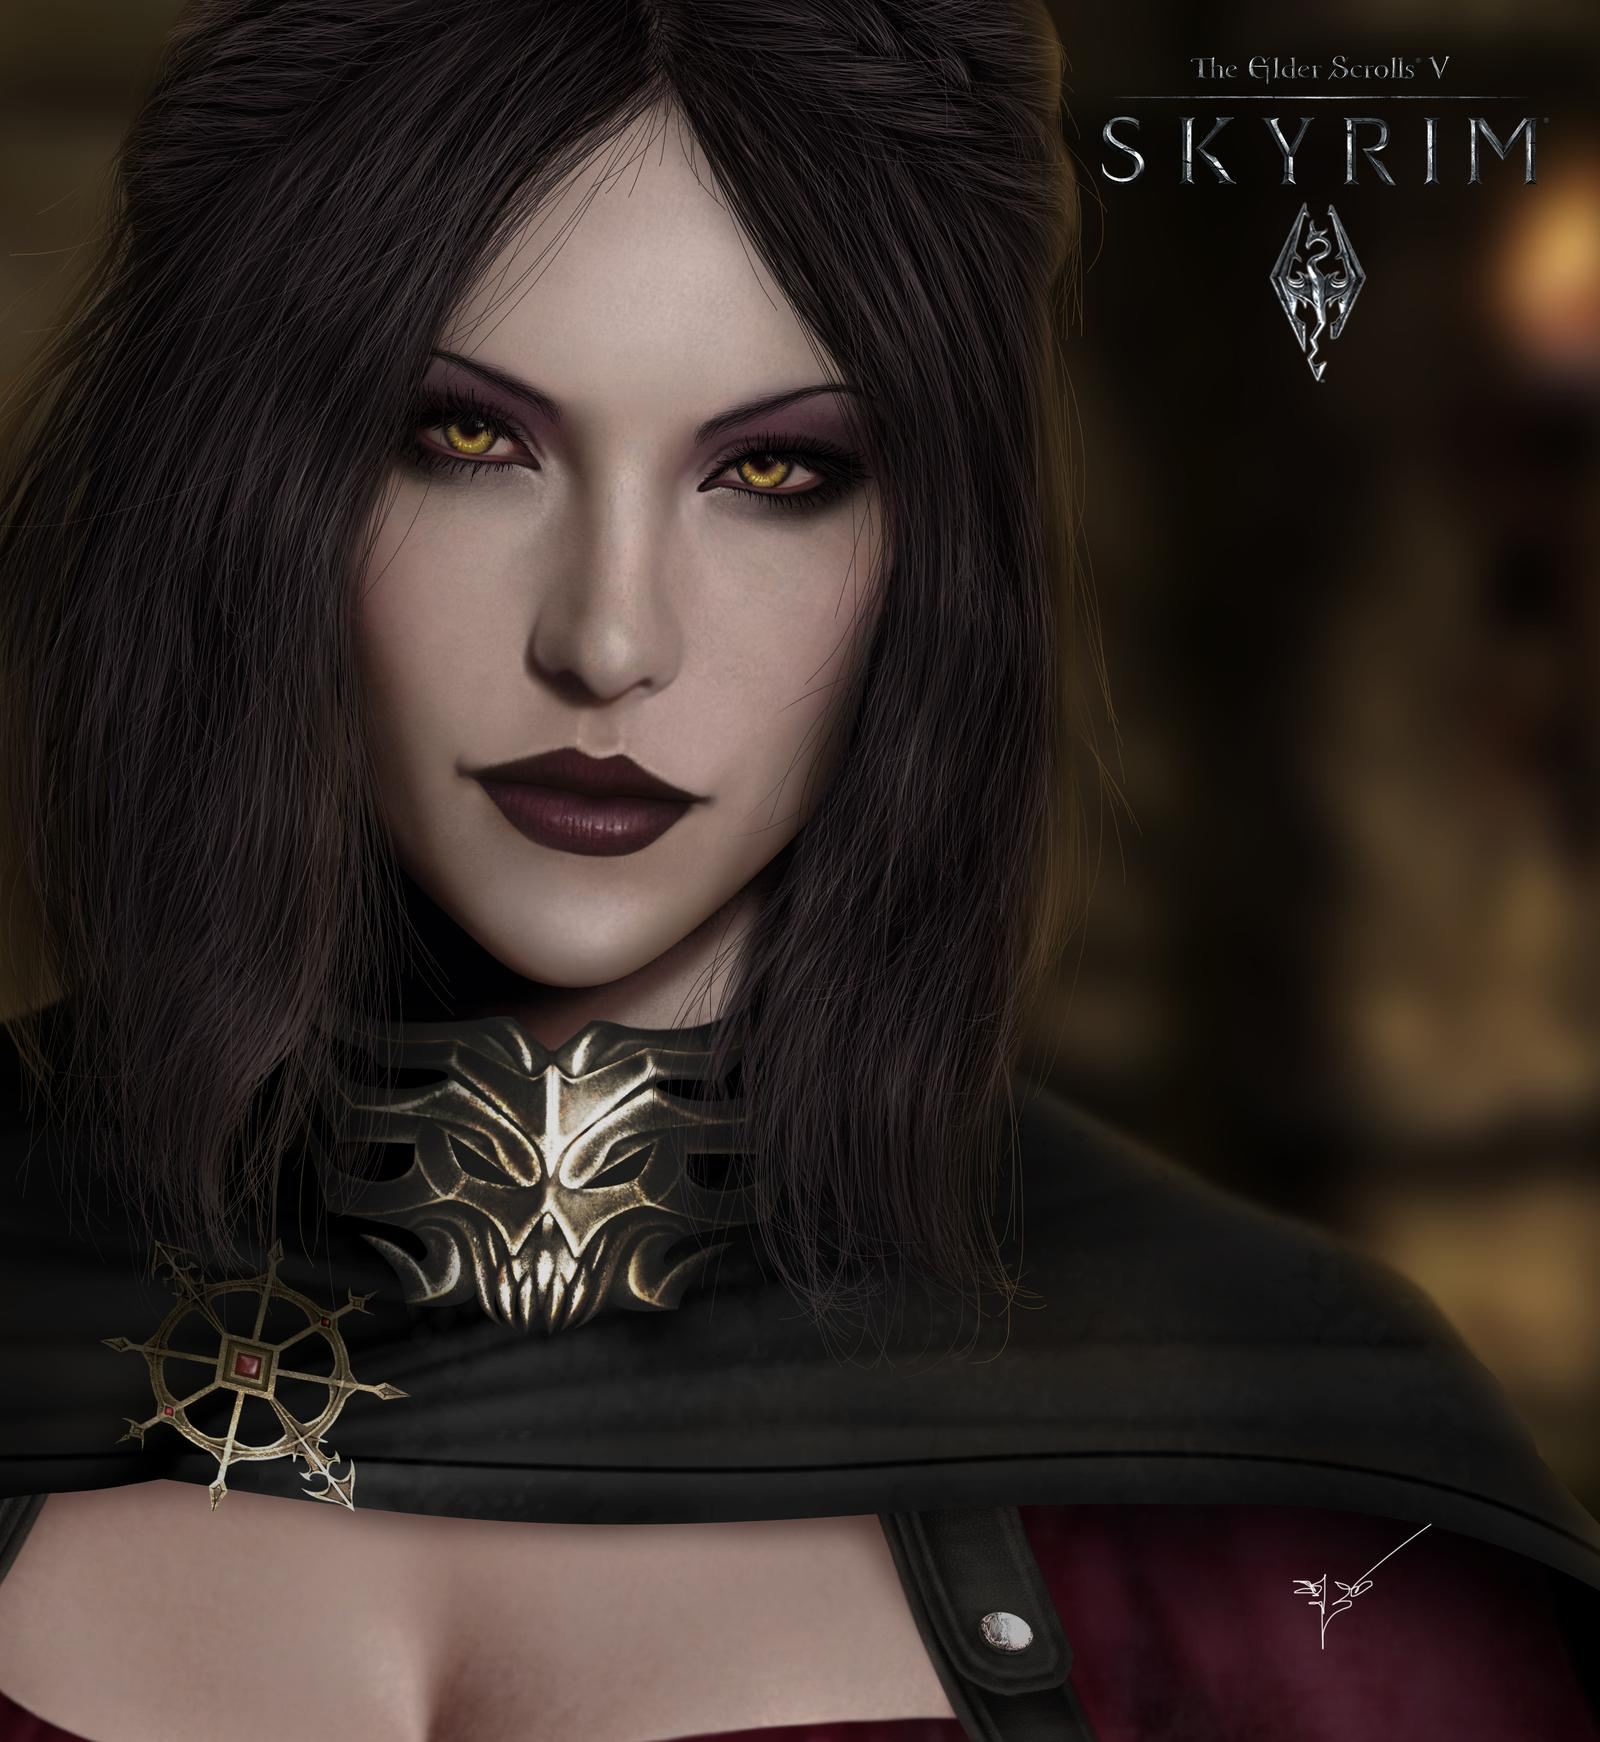 by thanomluk - The Elder Scrolls 5: Skyrim